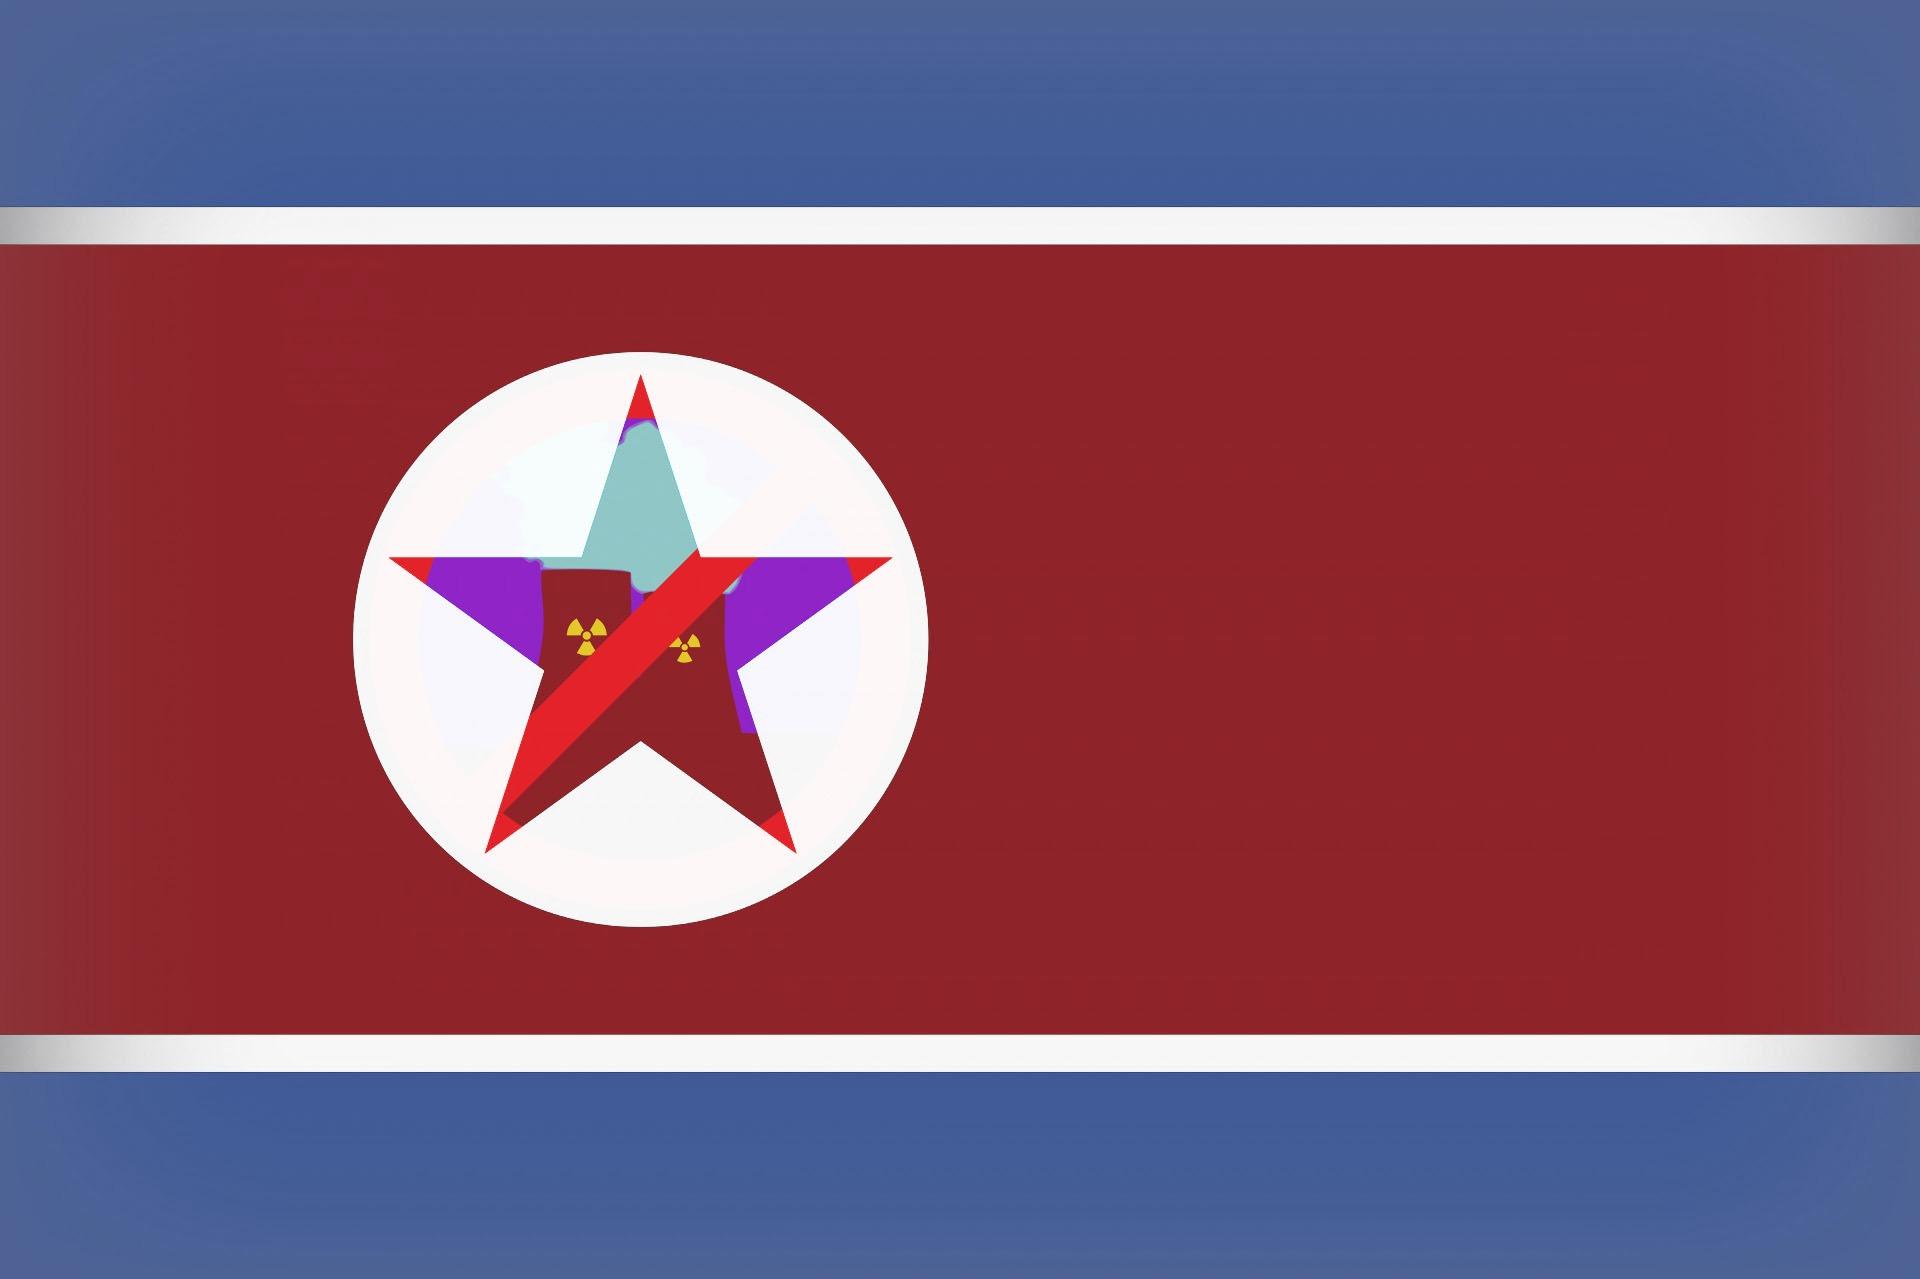 Denuclearizing North Korea - Agenda for Action